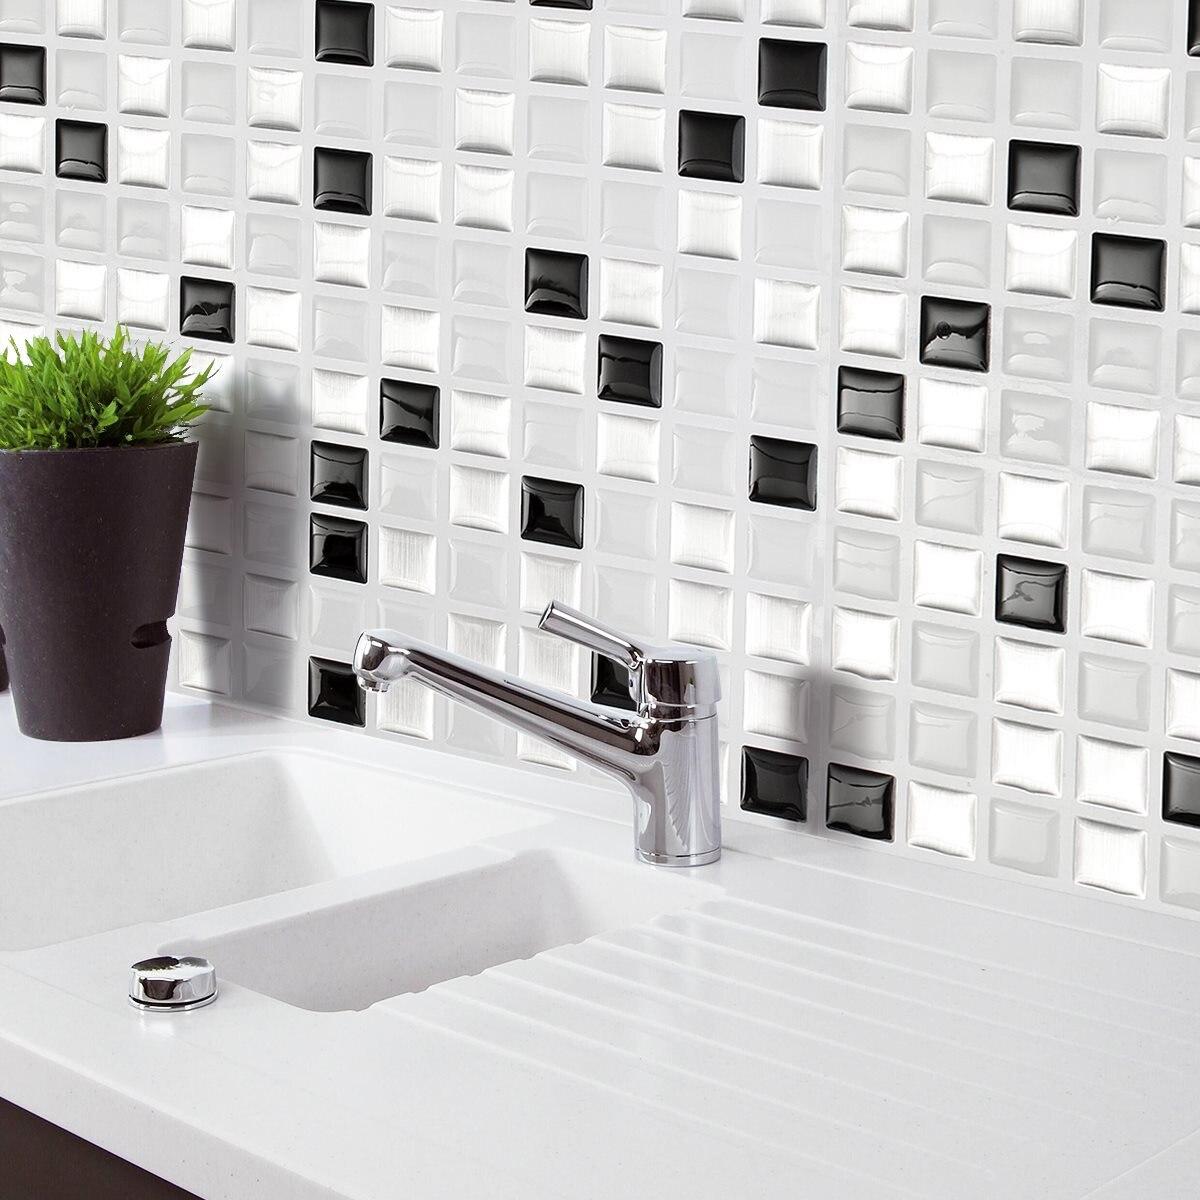 Best Kitchen Gallery: Home Decor Brick Mosaic Kitchen Bathroom Foil Beauty 3d Wallpaper of Foil Kitchen Tile on rachelxblog.com